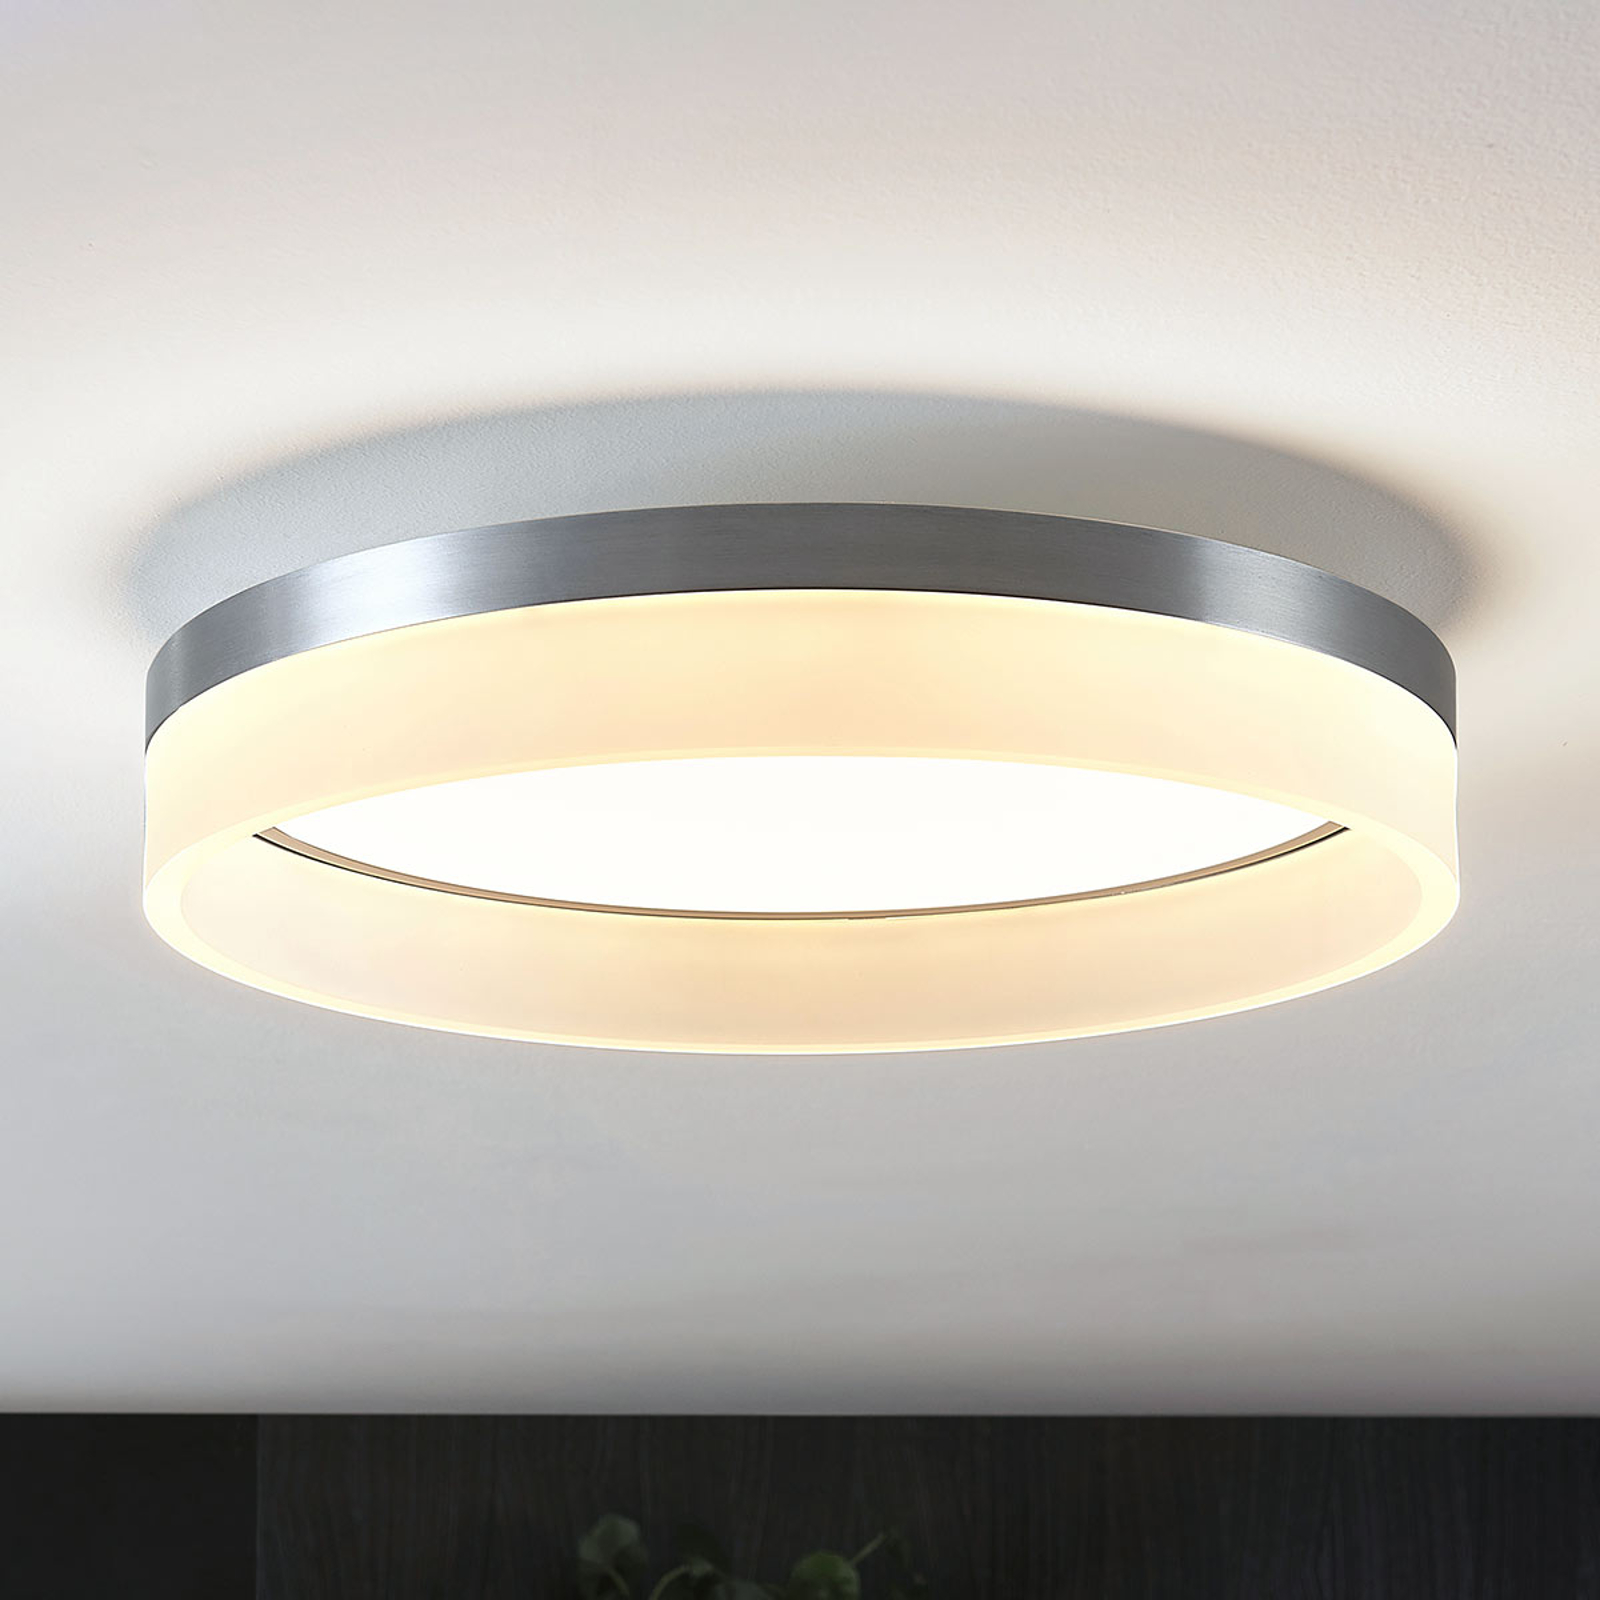 Lampa sufitowa LED Jessica, okrągła